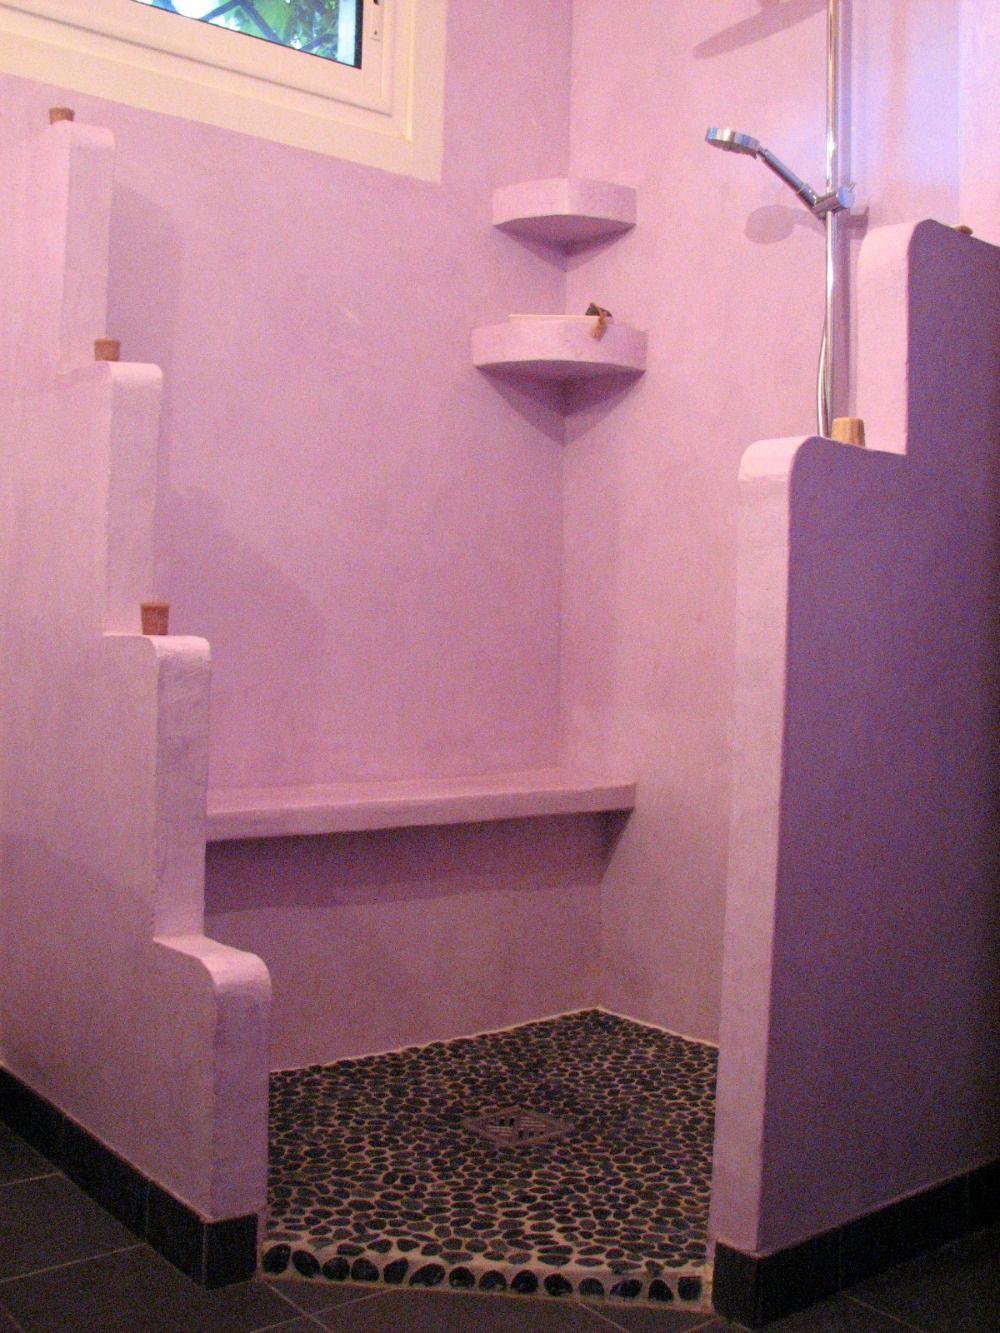 Décoration Salle de bain, espace douche en tadelakt marocain realise ...